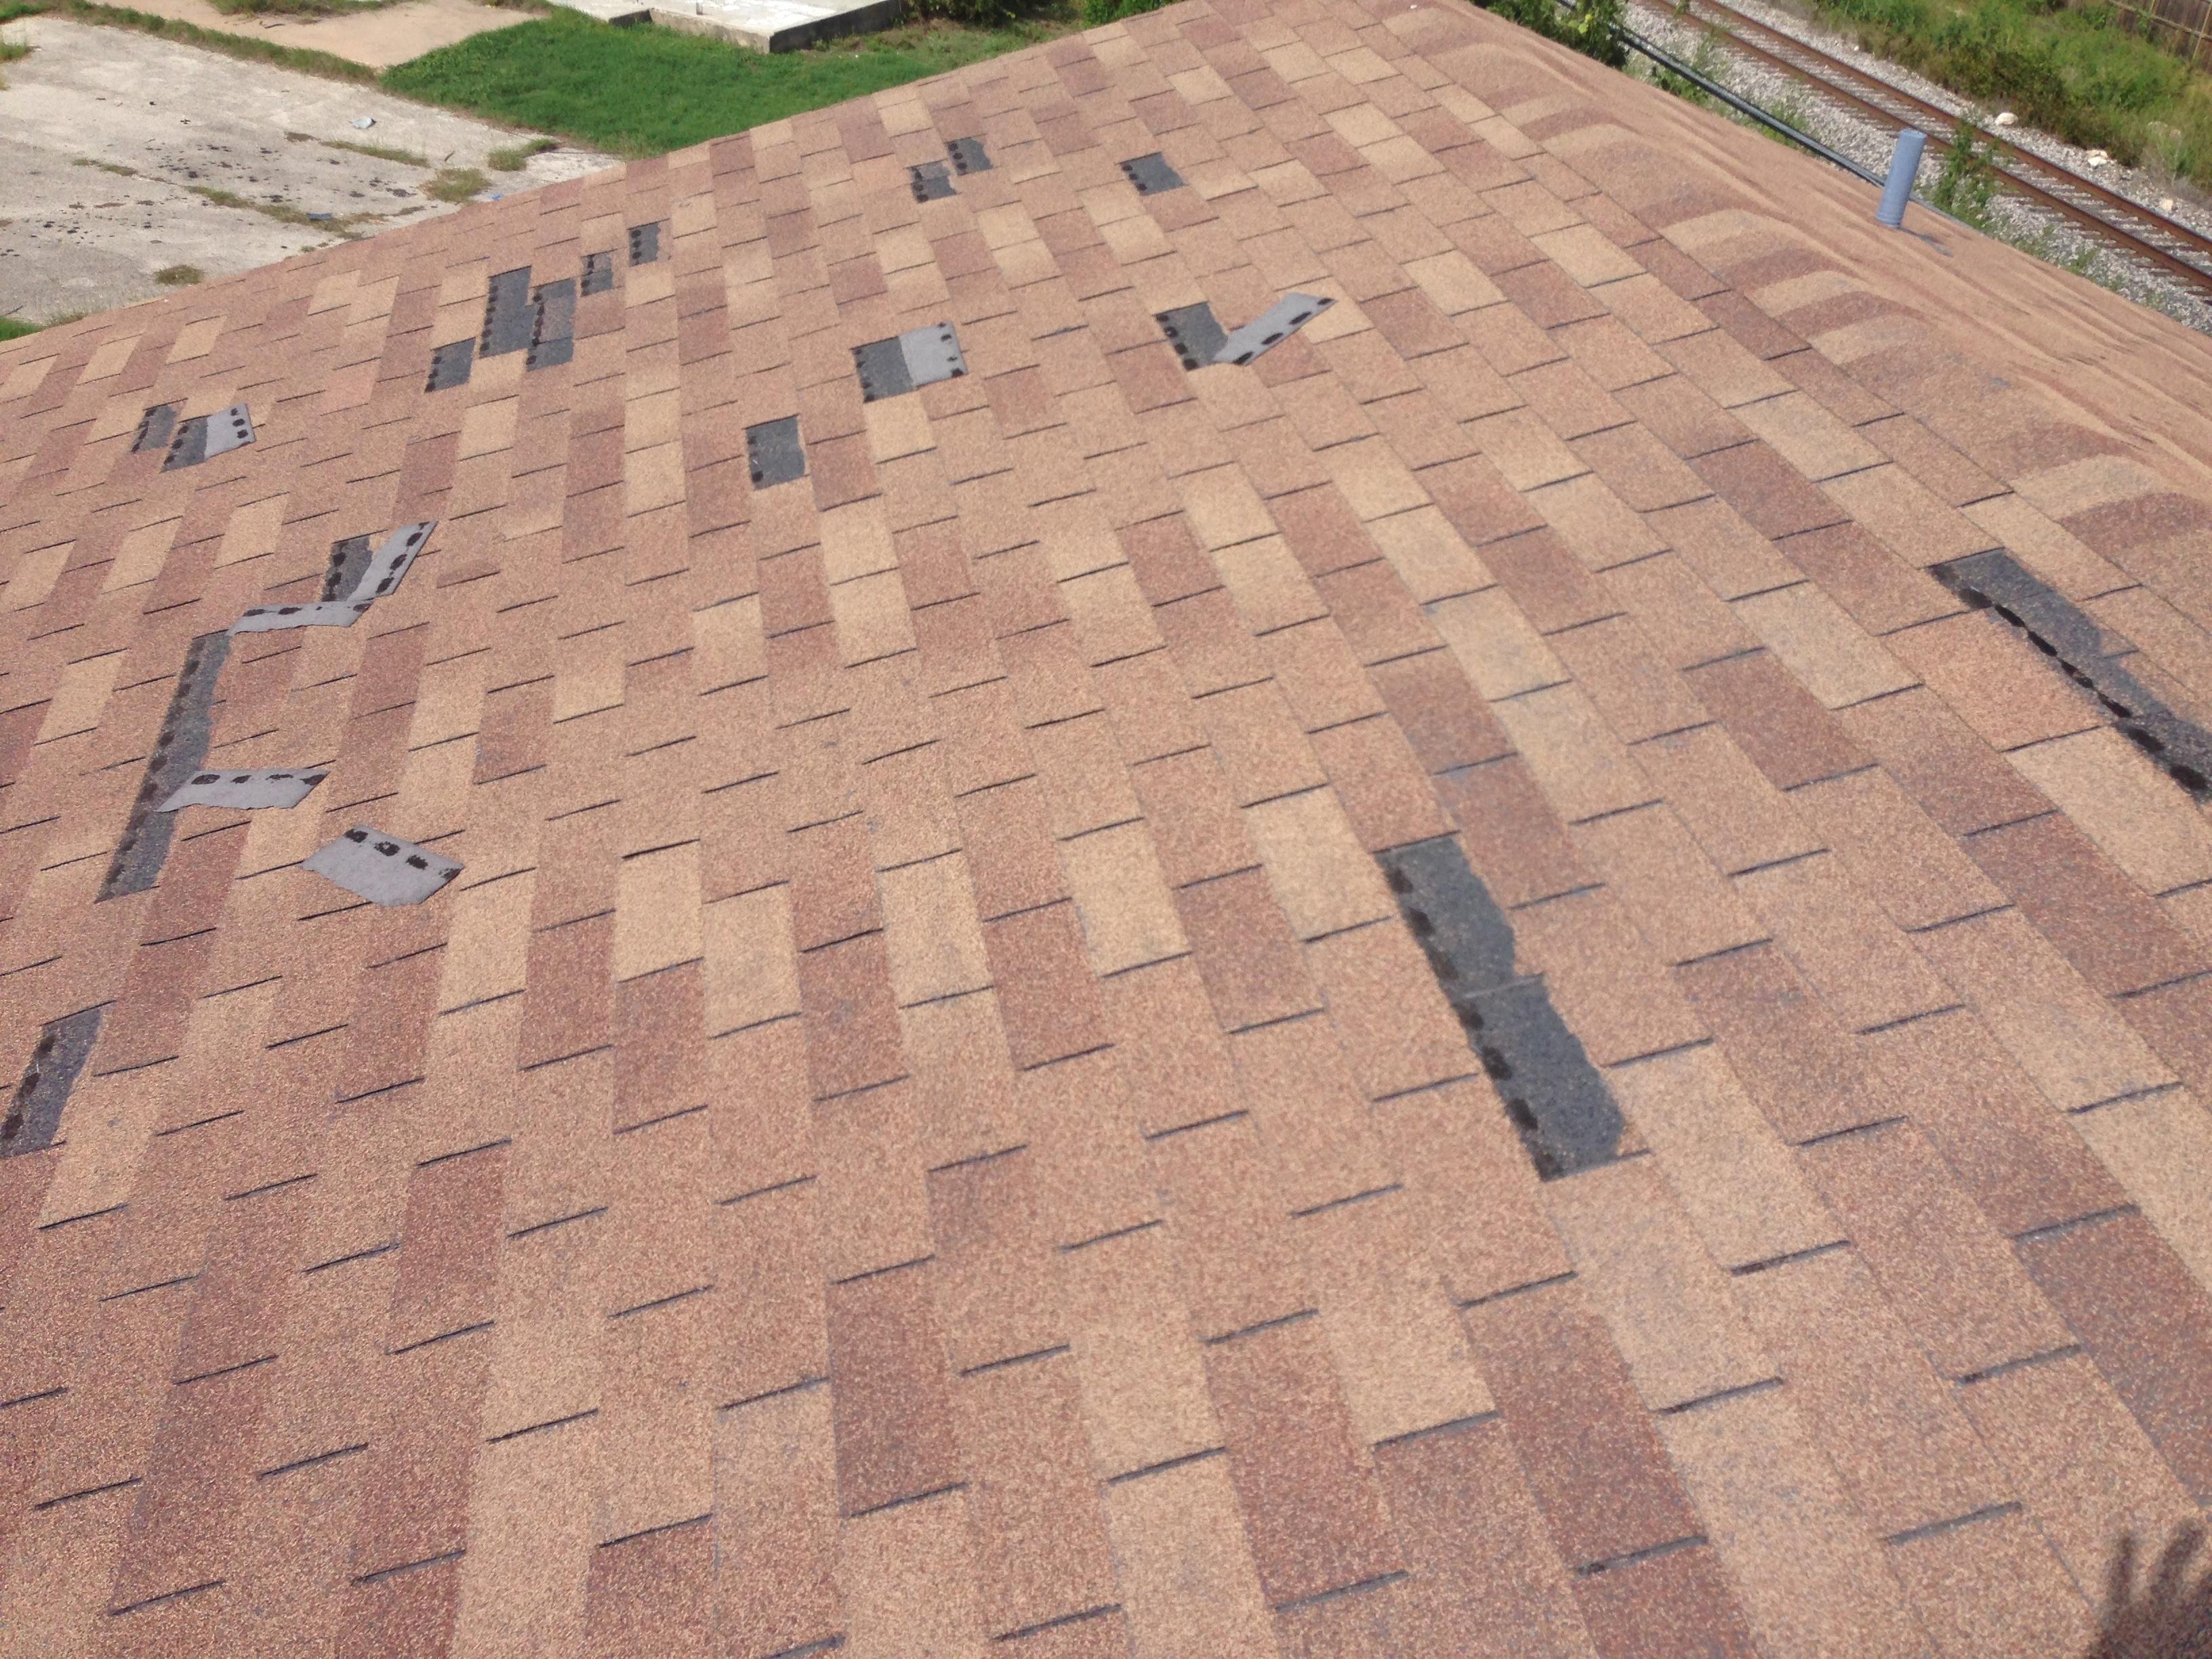 Roofing Austin Texas Five Roof Associated Dangers